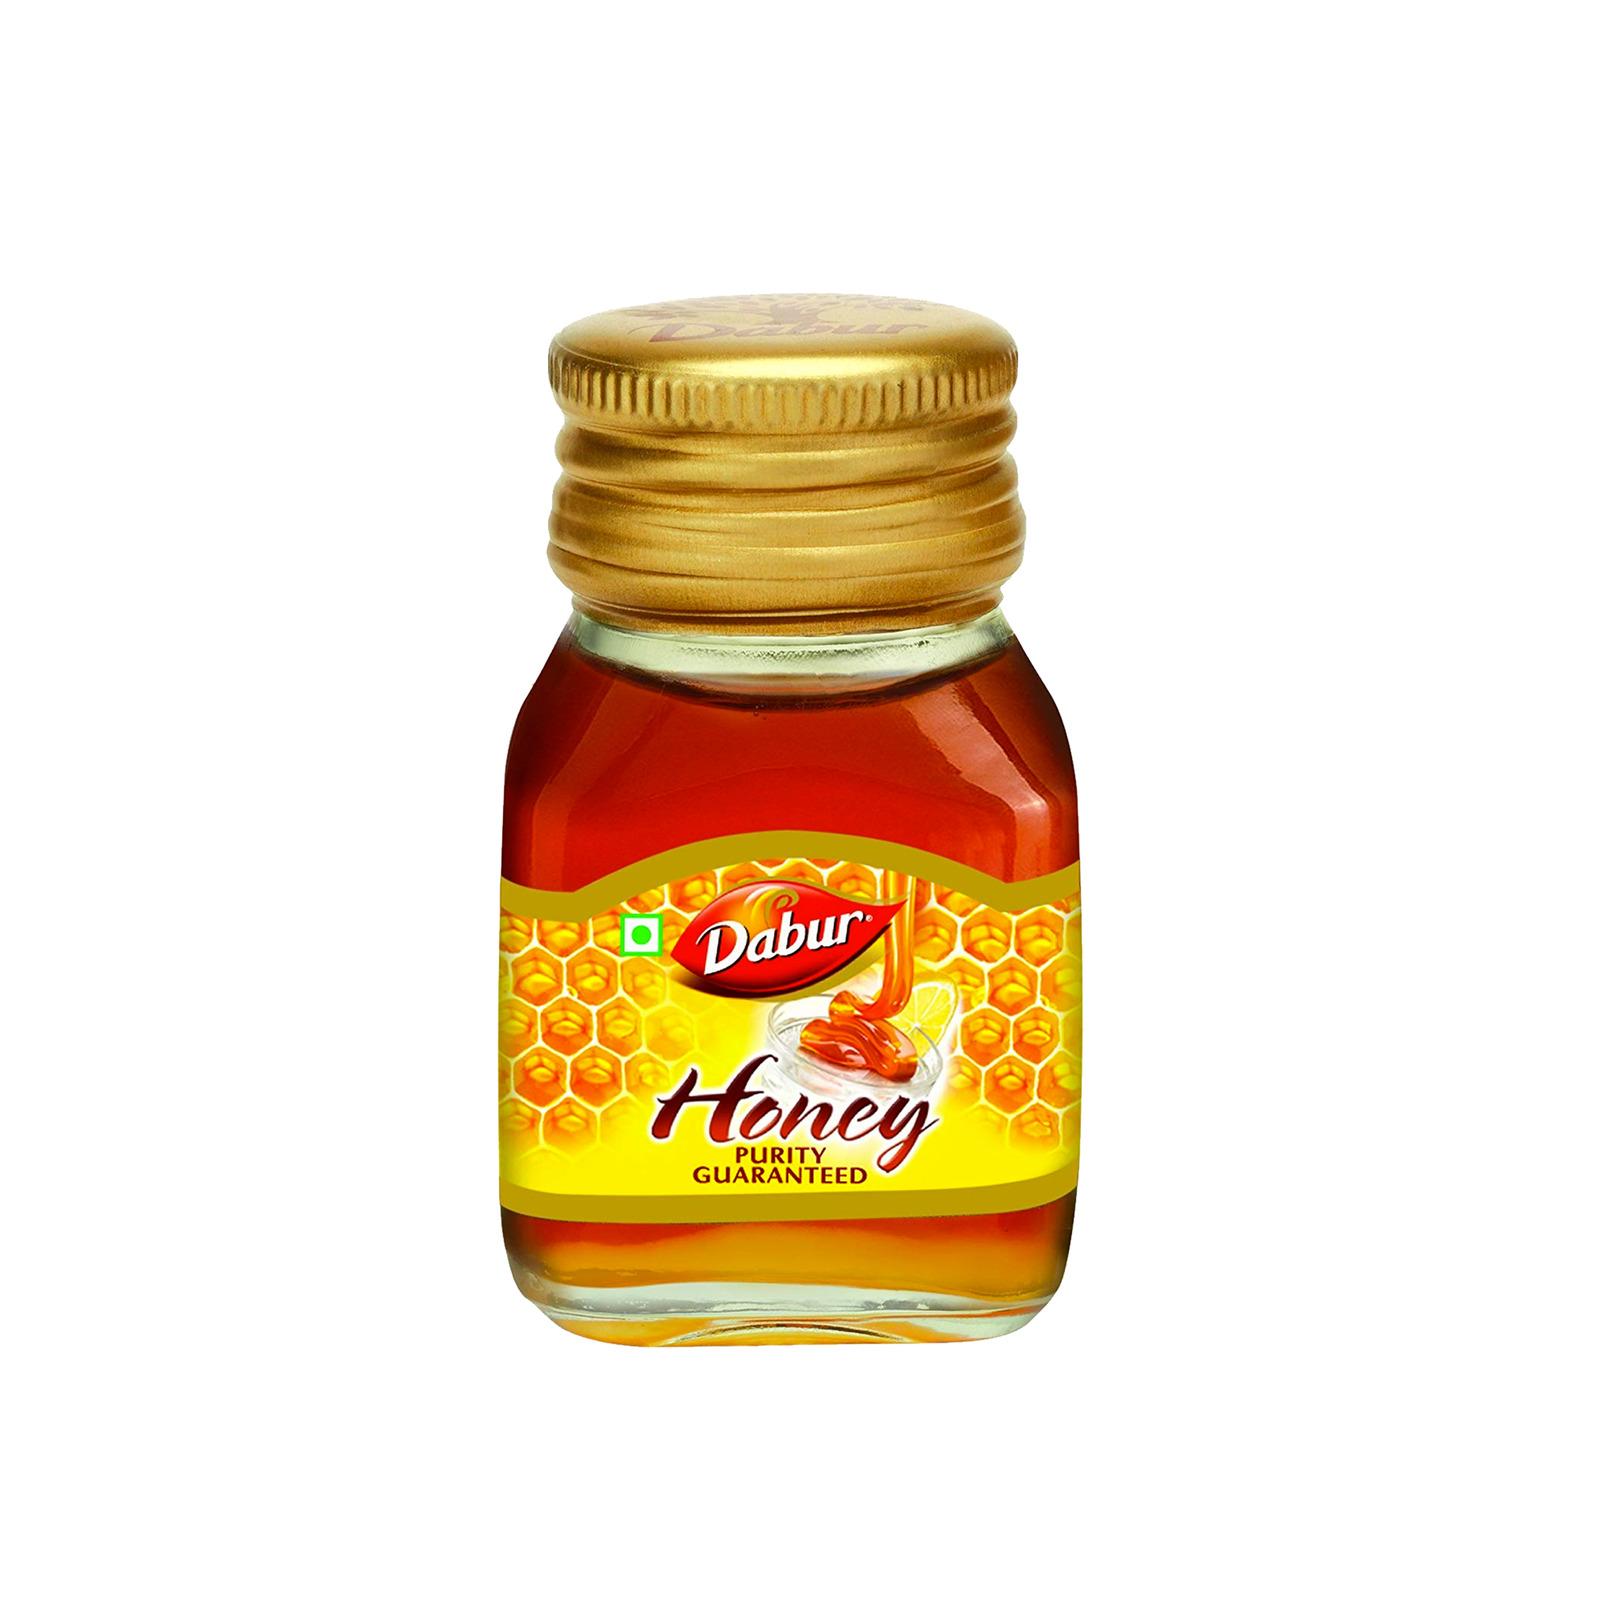 Dabur Honey - By Sonnamera